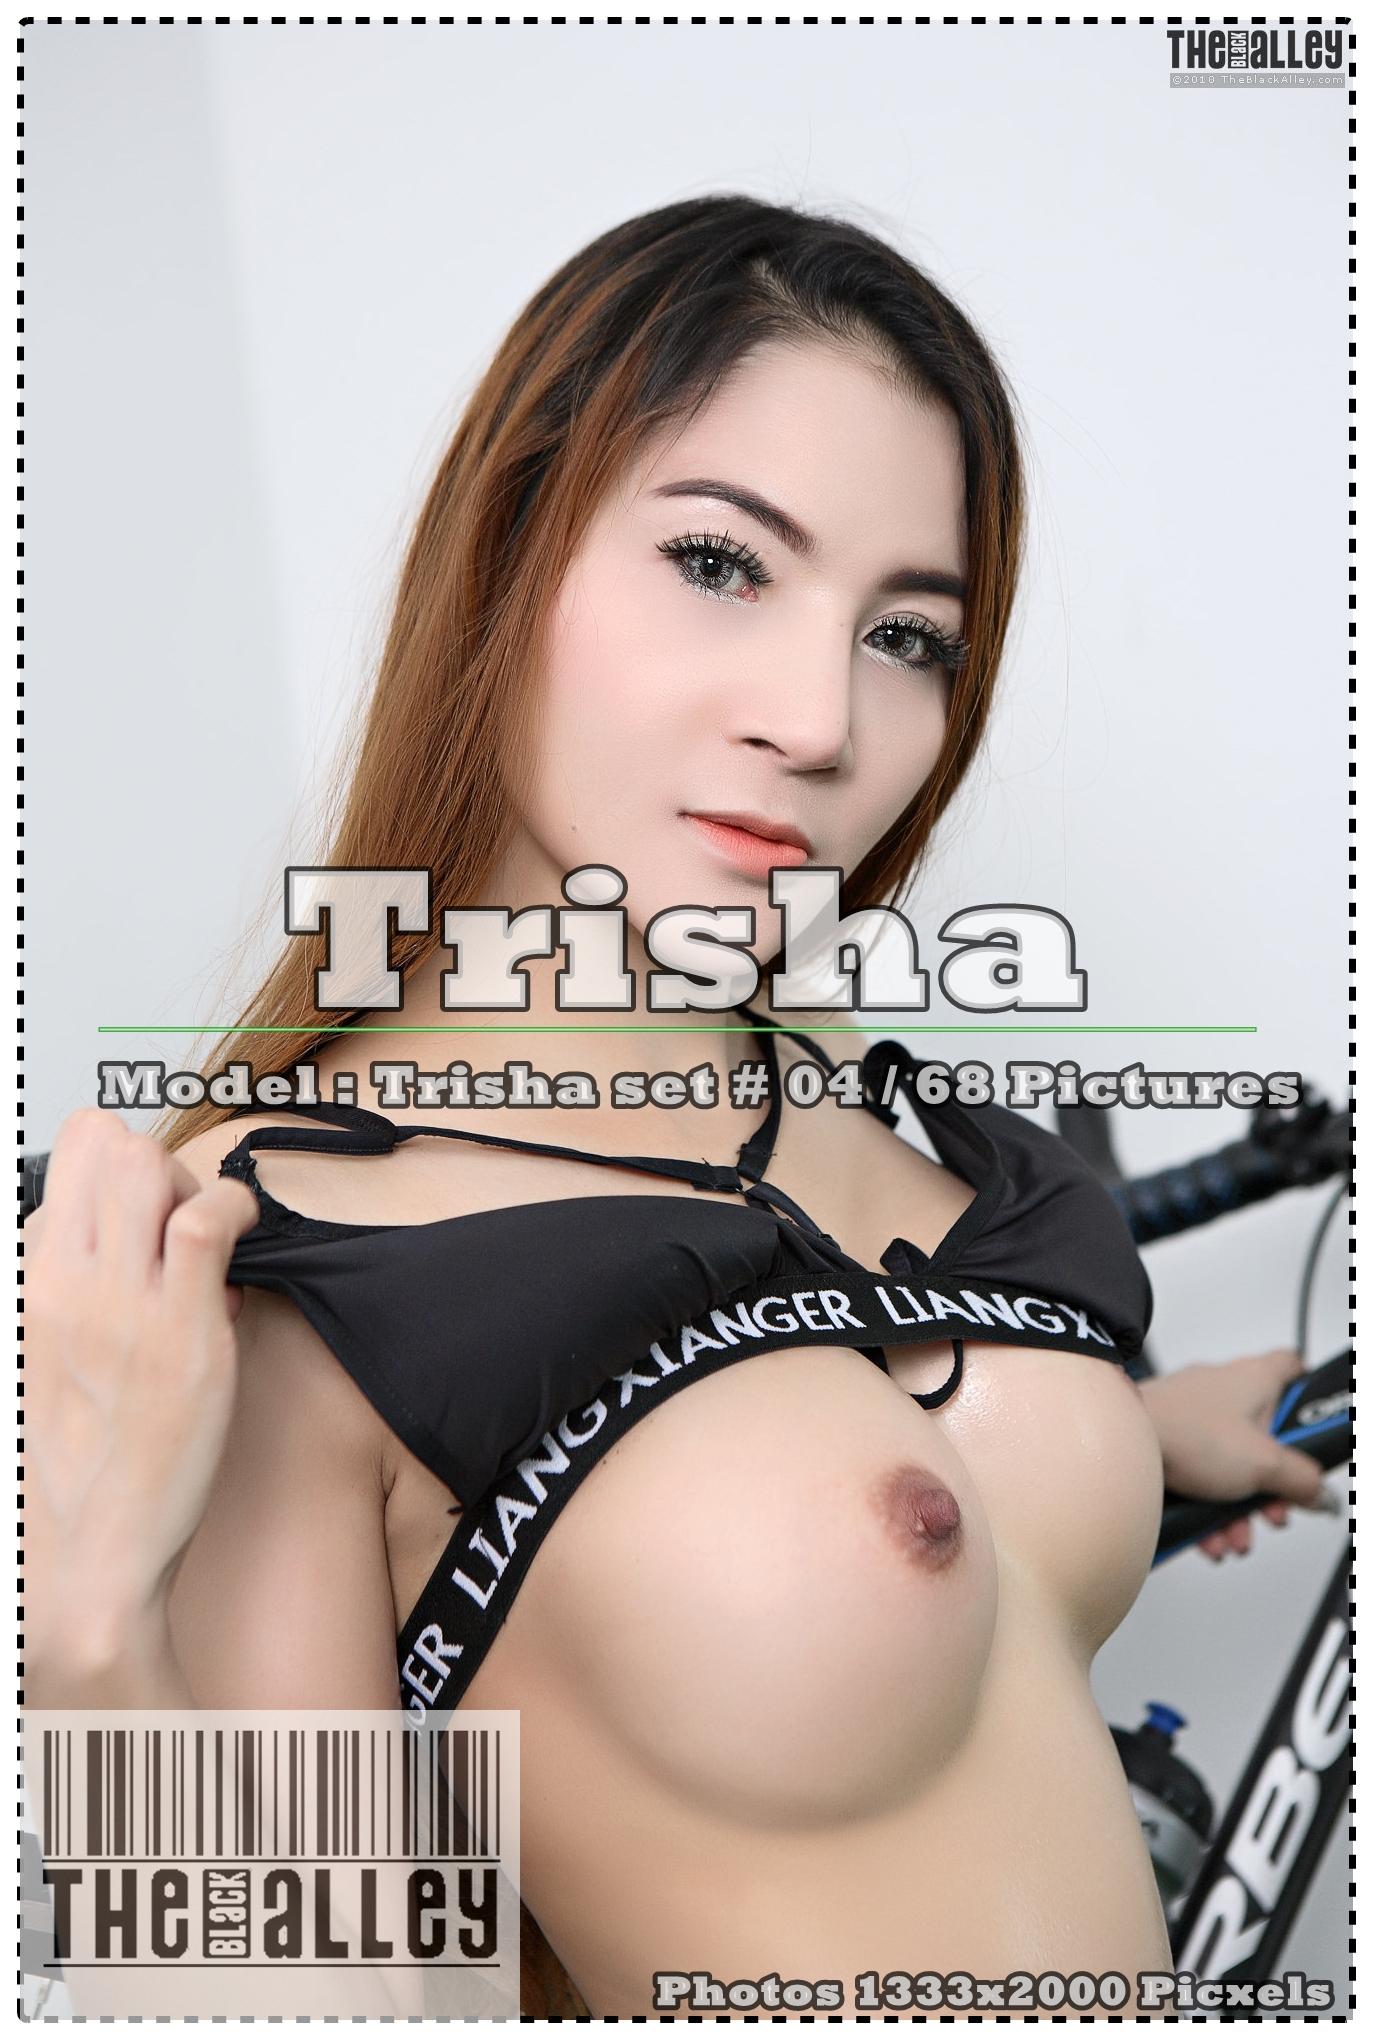 litu 100 archives: [TheBlackAlley] Trisha Set 04